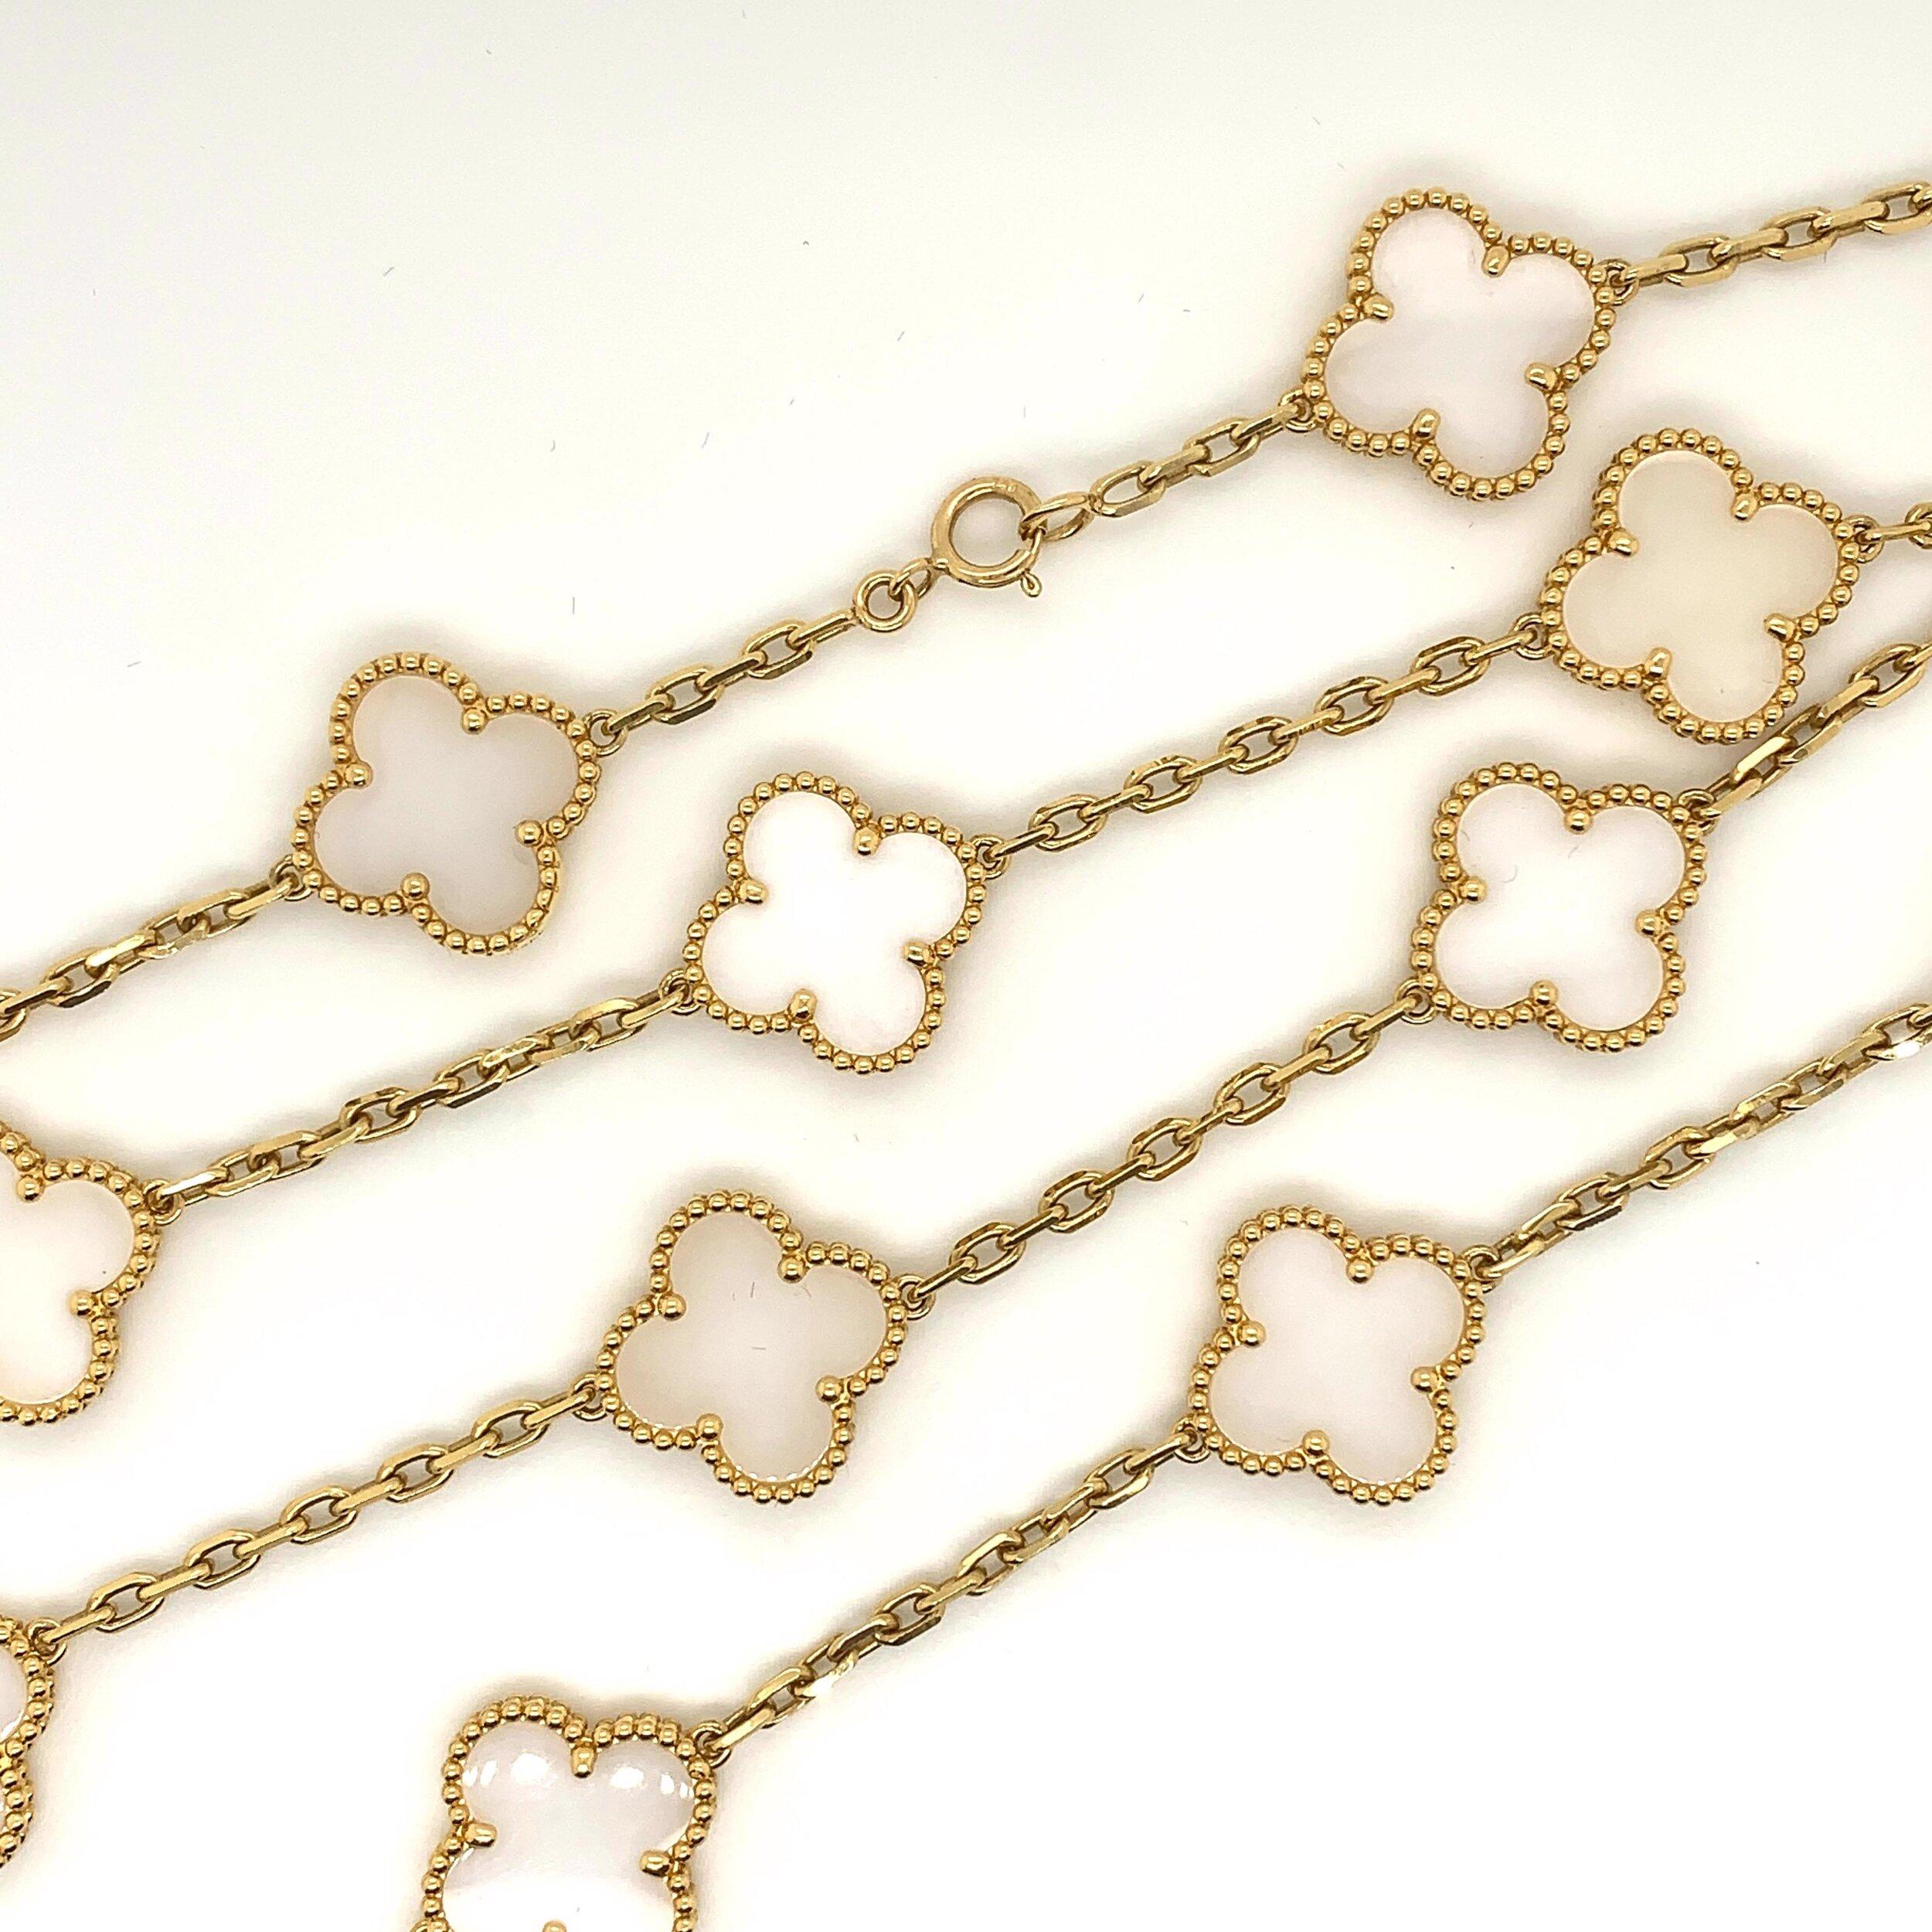 Van Cleef & Arpels 20 Motif Alhambra Gold and White Coral Necklace   Est. US$ 30,000-35,000